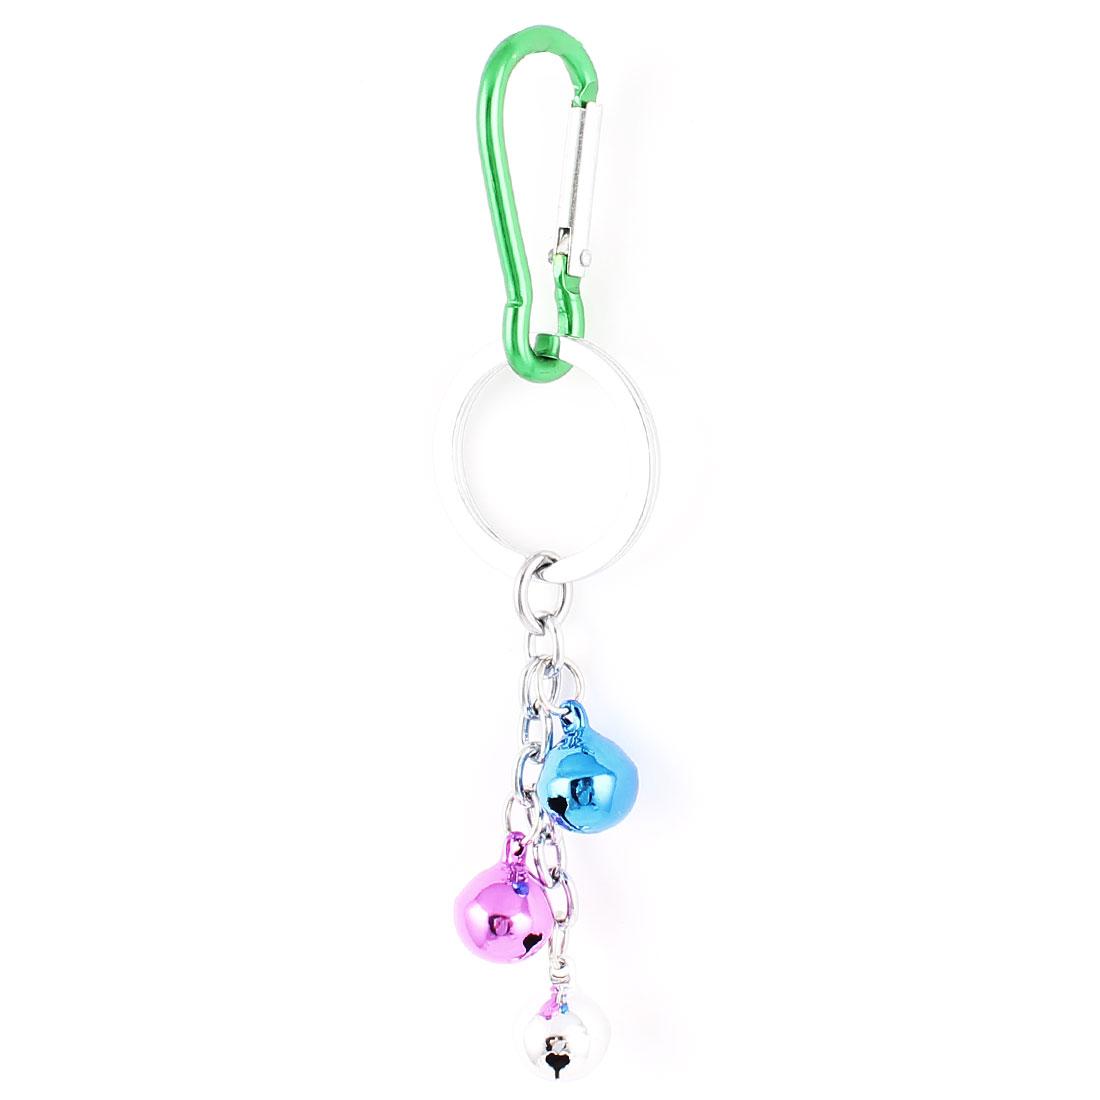 Carabiner Hook 3 Bells Pendant Key Ring Holder Keychain Keyring Green